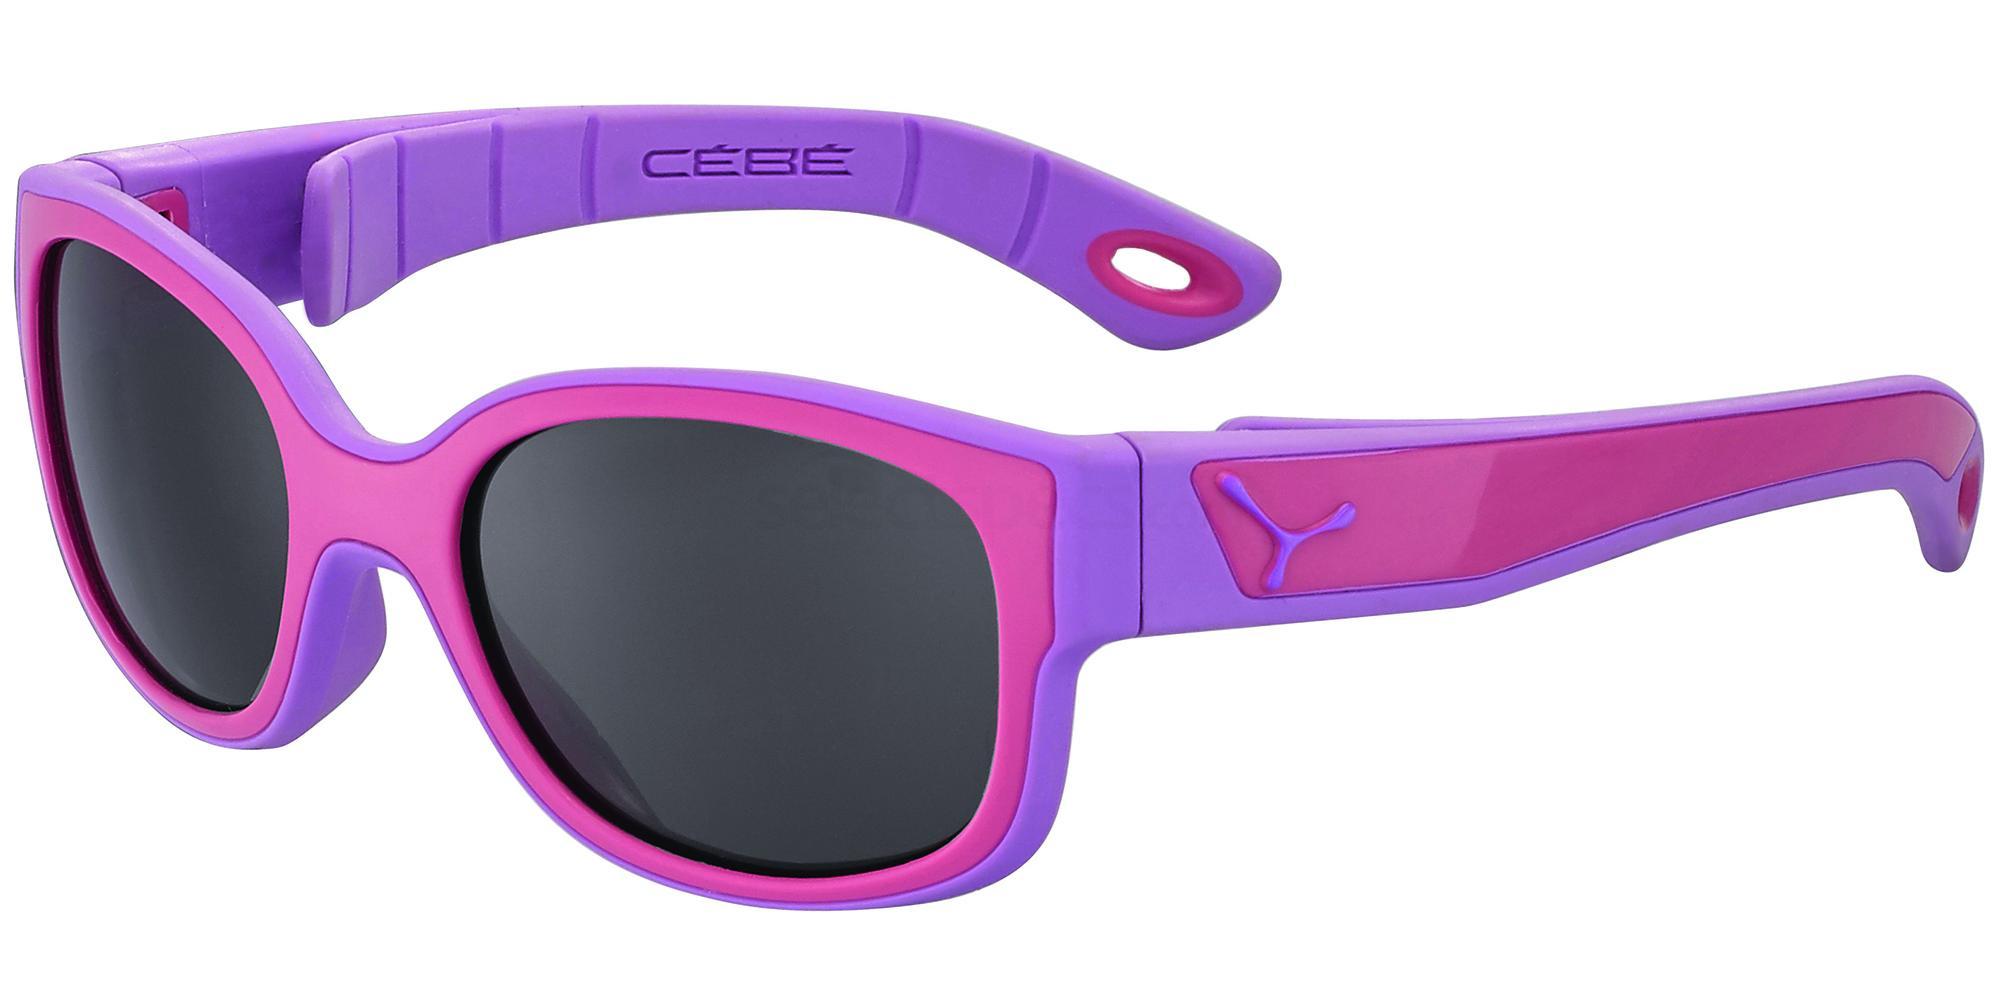 CBSPIES2 S'pies (Age 3-5) Sunglasses, Cebe JUNIOR